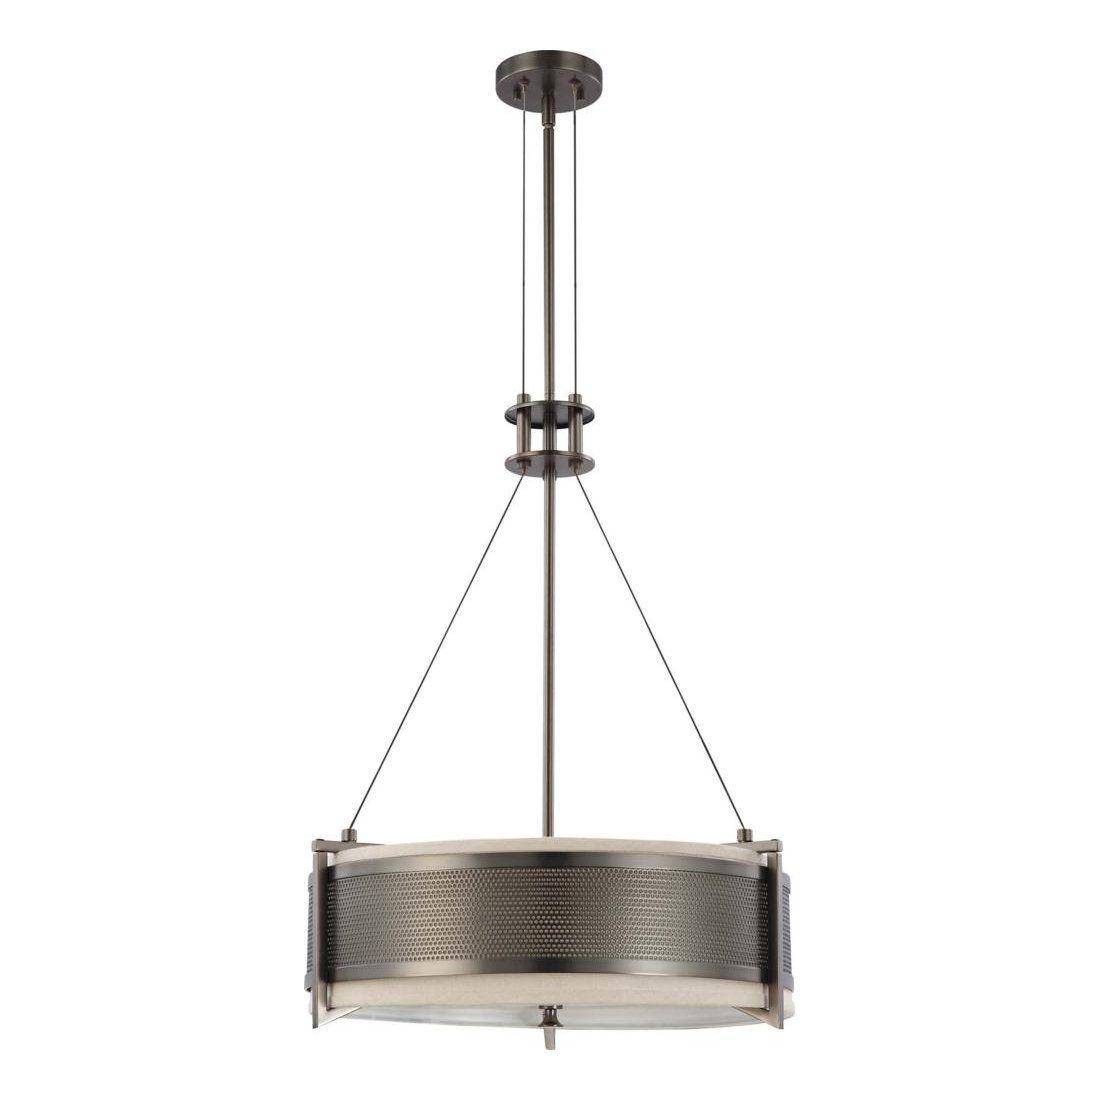 Nuvo Lighting 60-4 4 Light Diesel Round Large Pendant